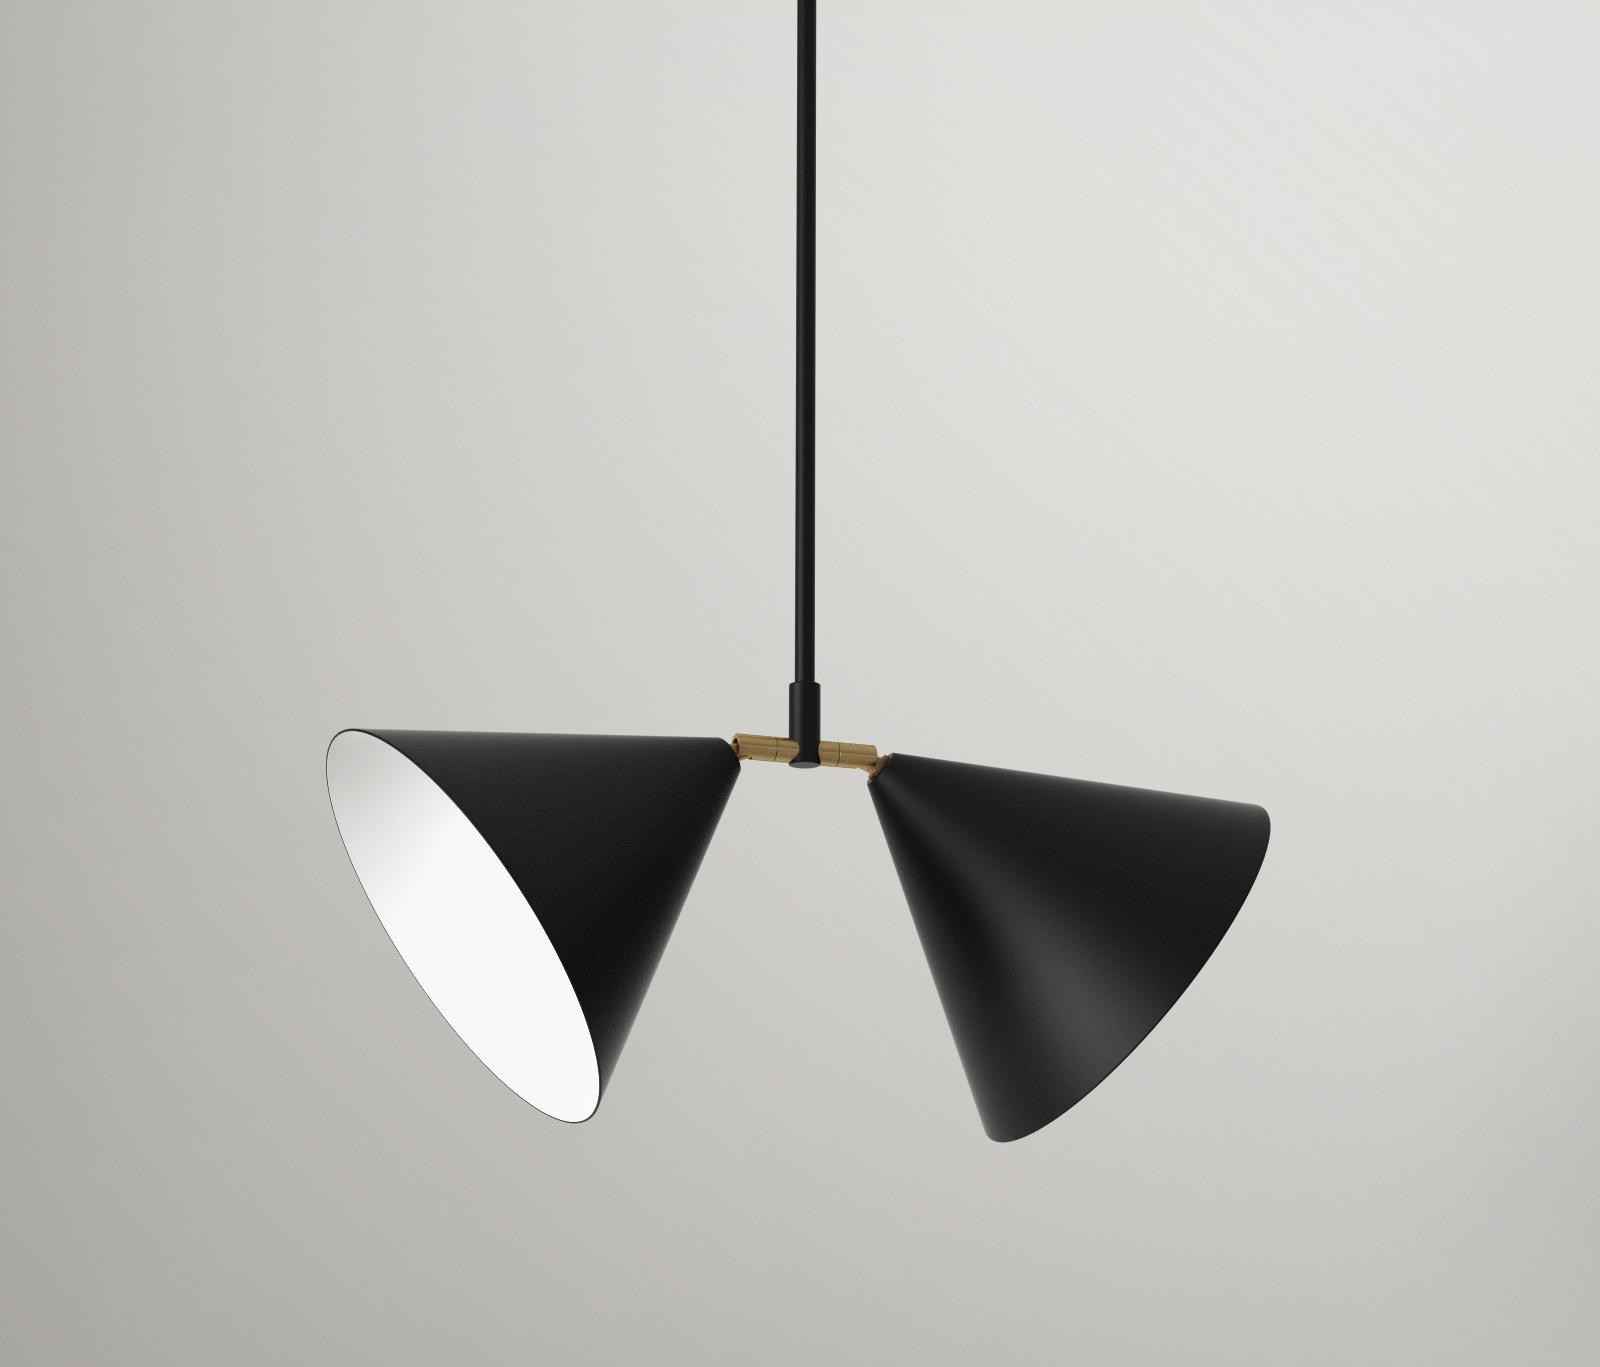 double pendant lighting. Double Pendant By Atelier Areti   General Lighting